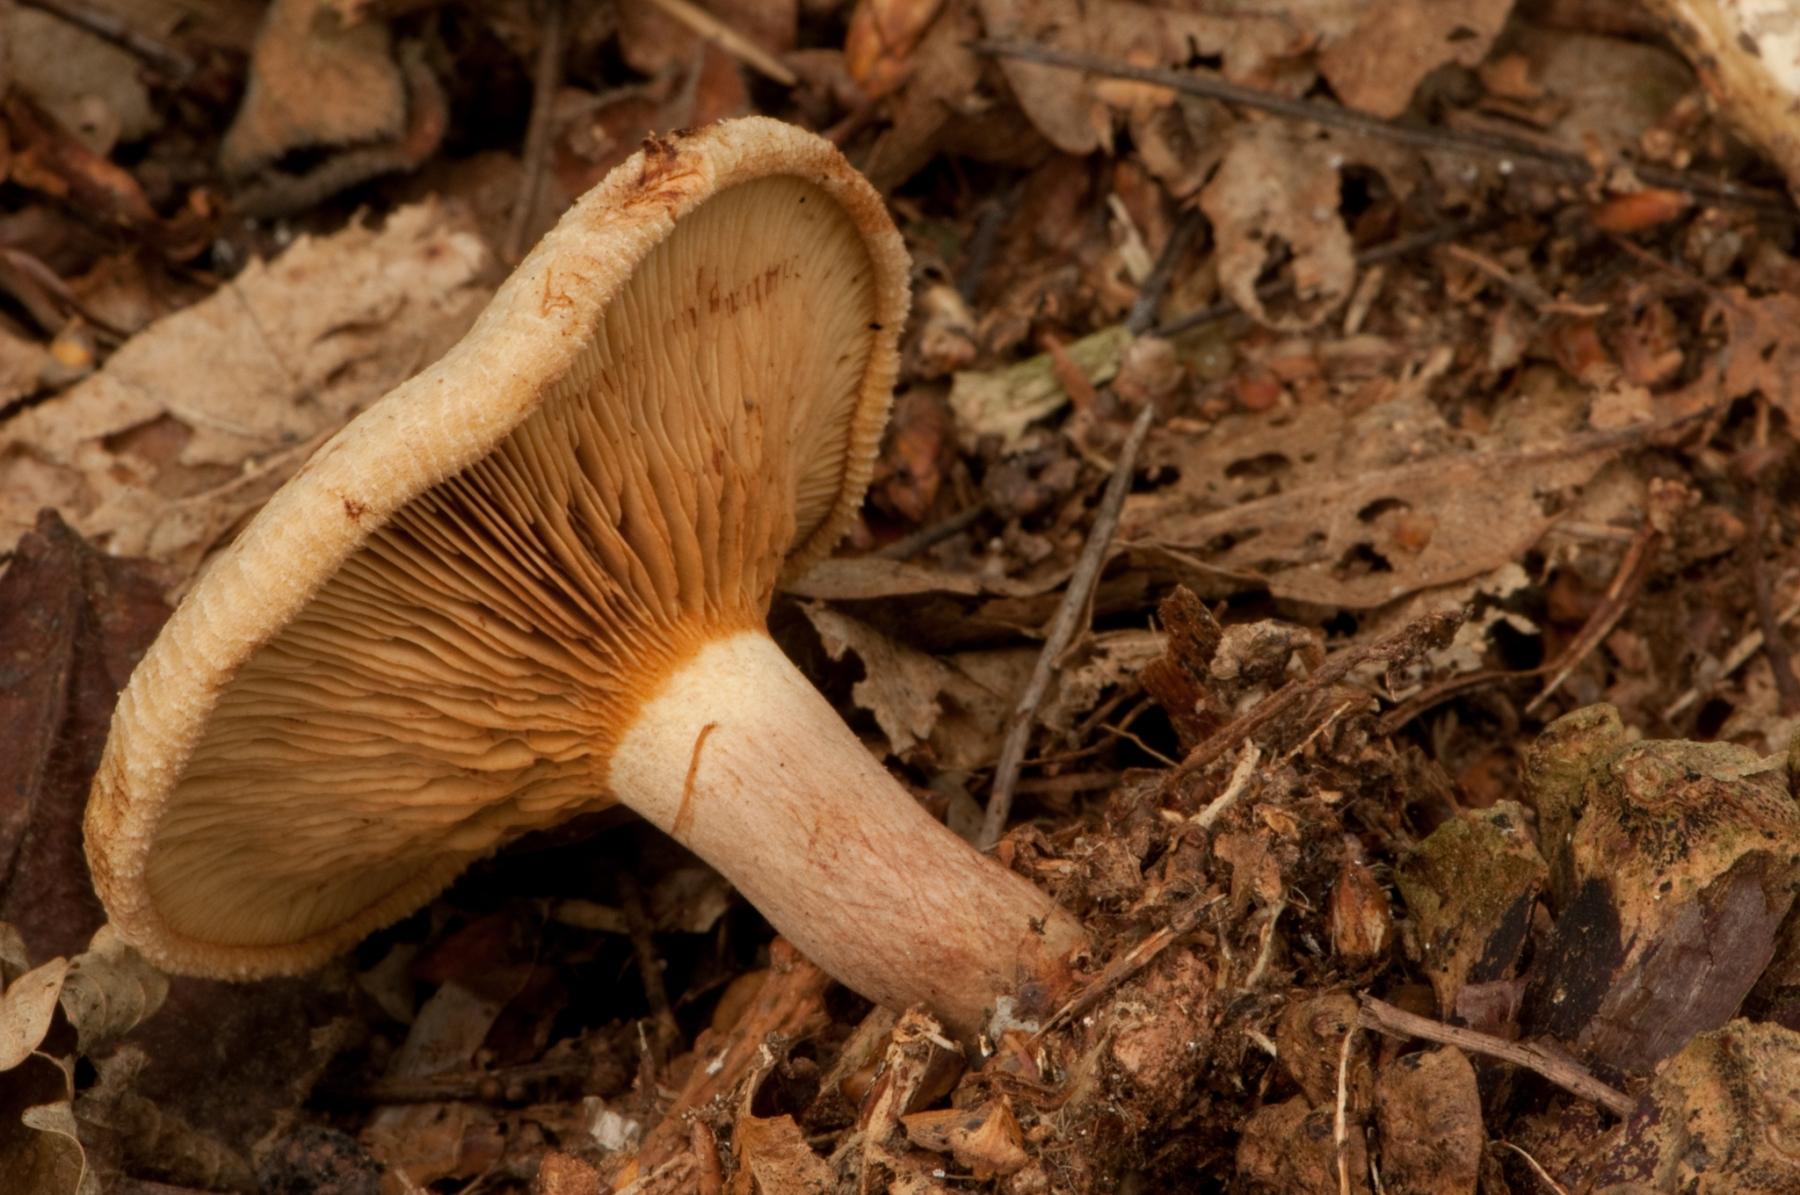 Paxillus involutus - Brown Rollrim, Clumber Park, Notts.